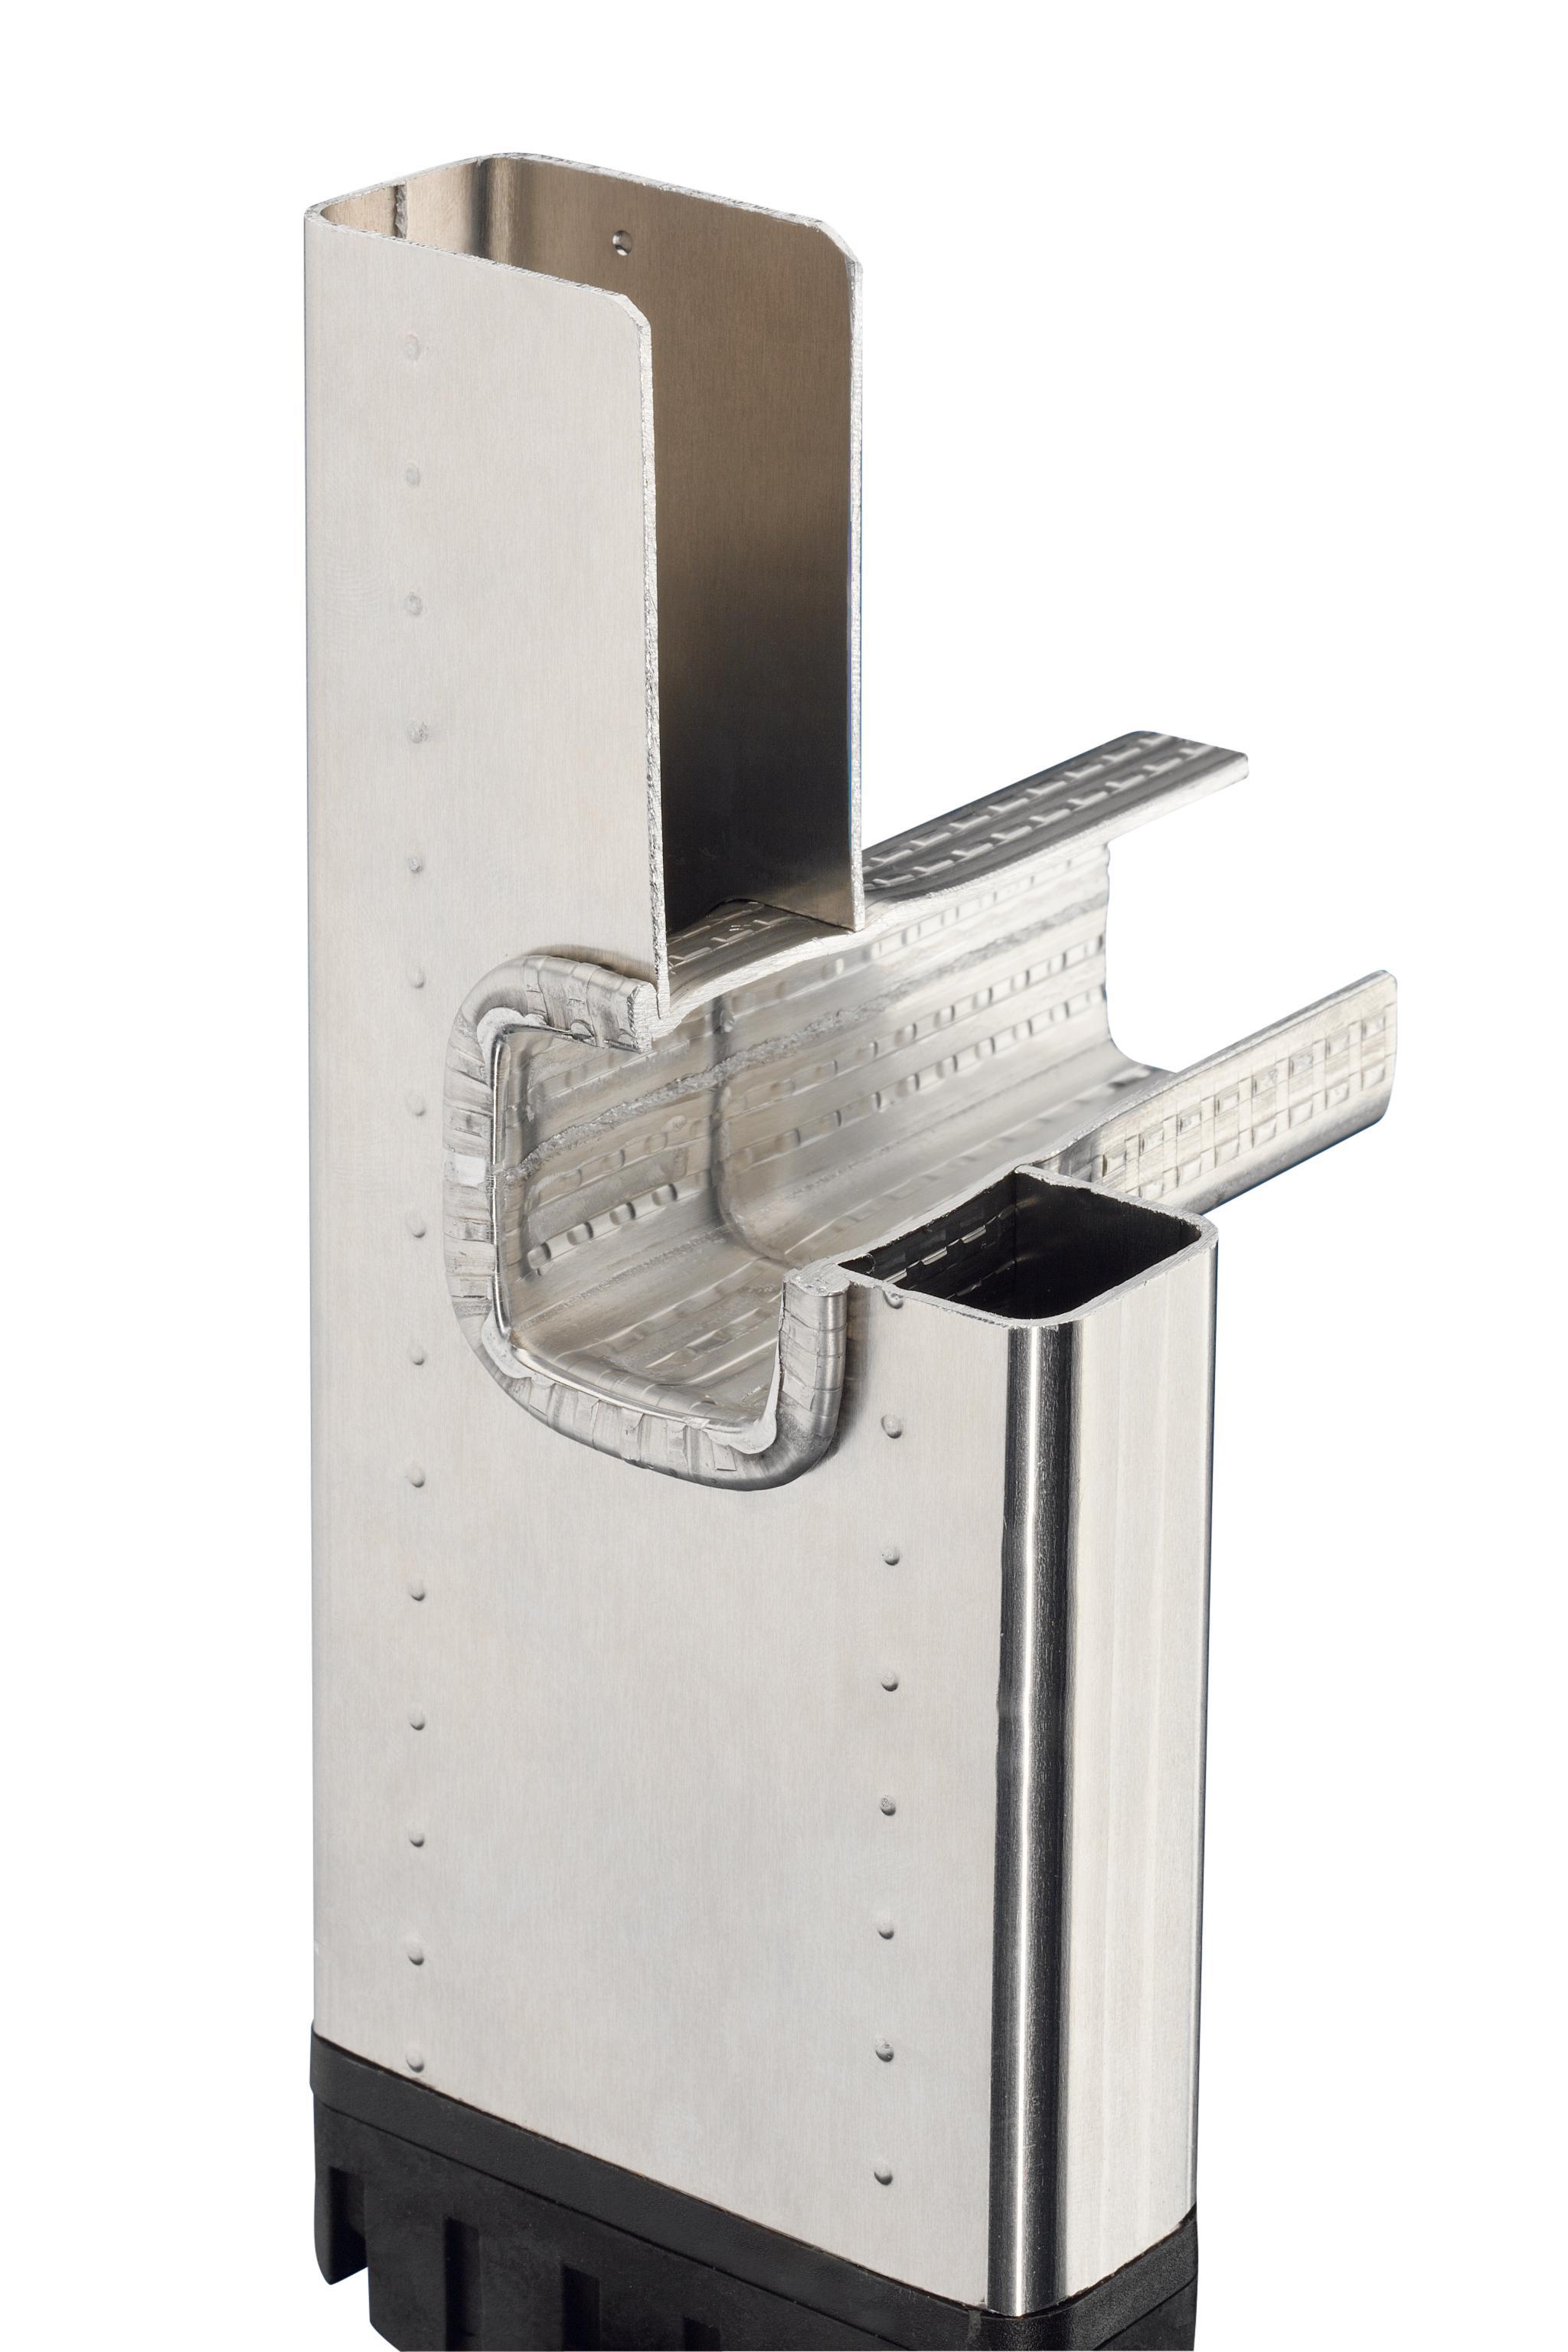 hailo 7106 001 alu anlegeleiter 6 sprossen profistep baumarkt. Black Bedroom Furniture Sets. Home Design Ideas